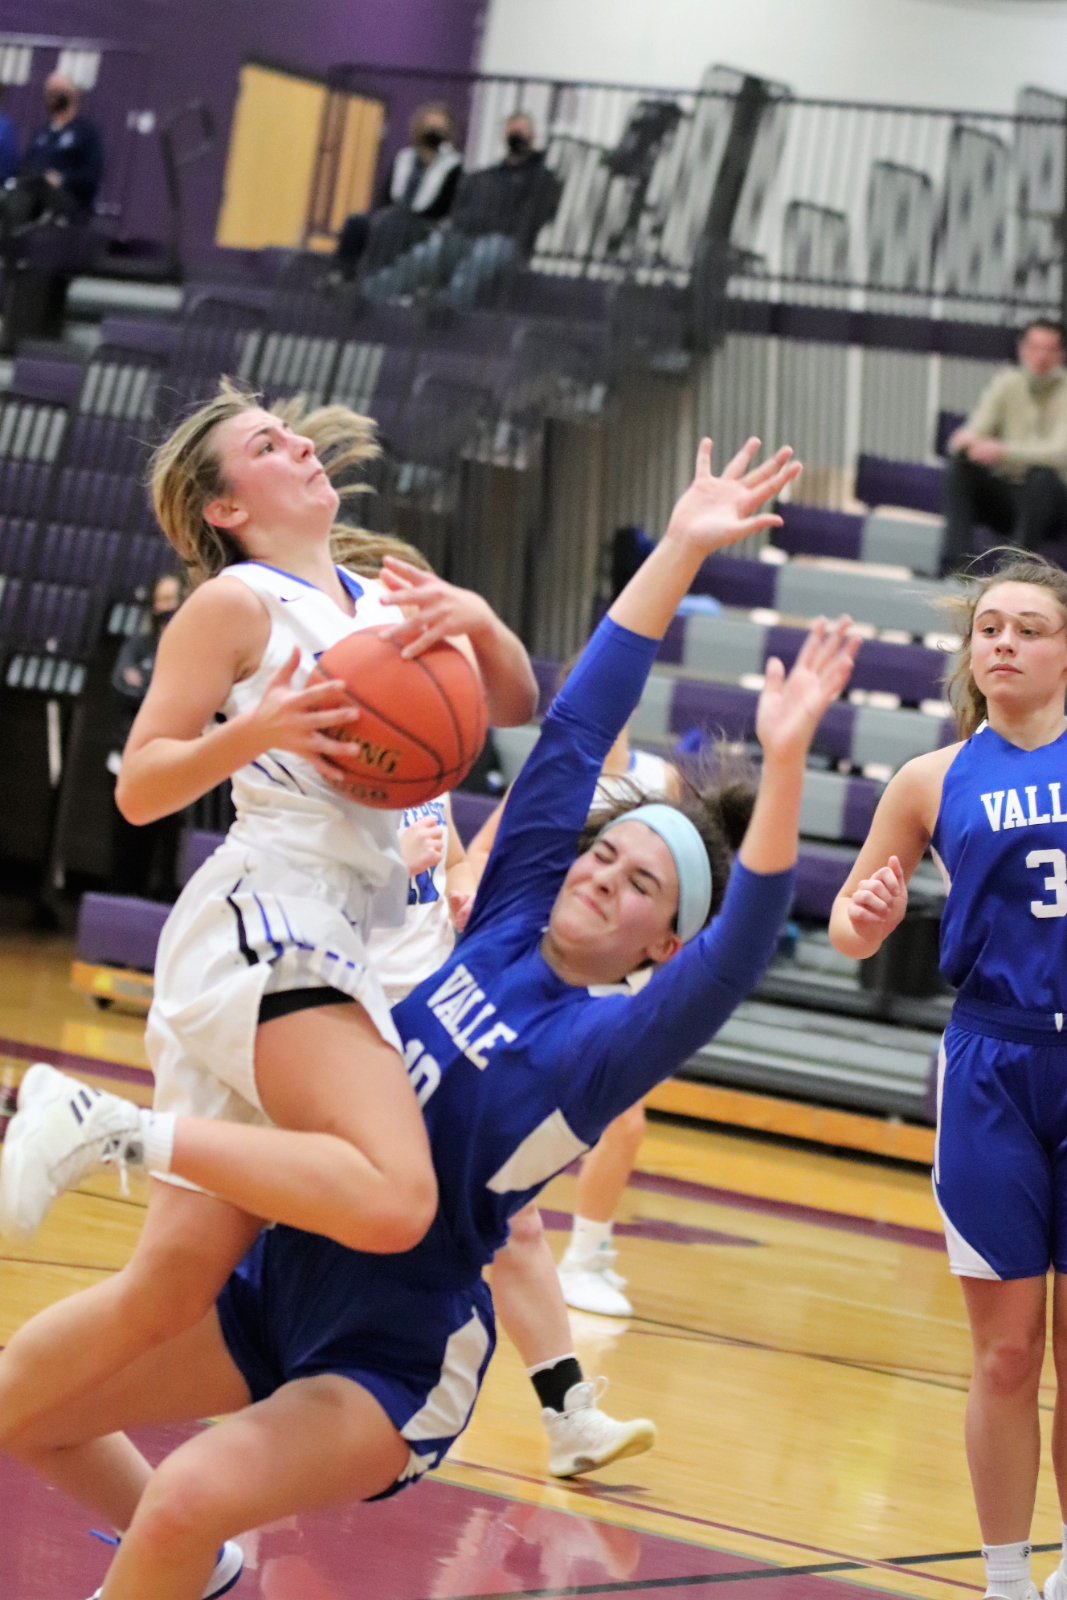 JHS Varsity Girls' Basketball defeats Valle Catholic 46-40 @Kingston Christmas Tournament 12/31